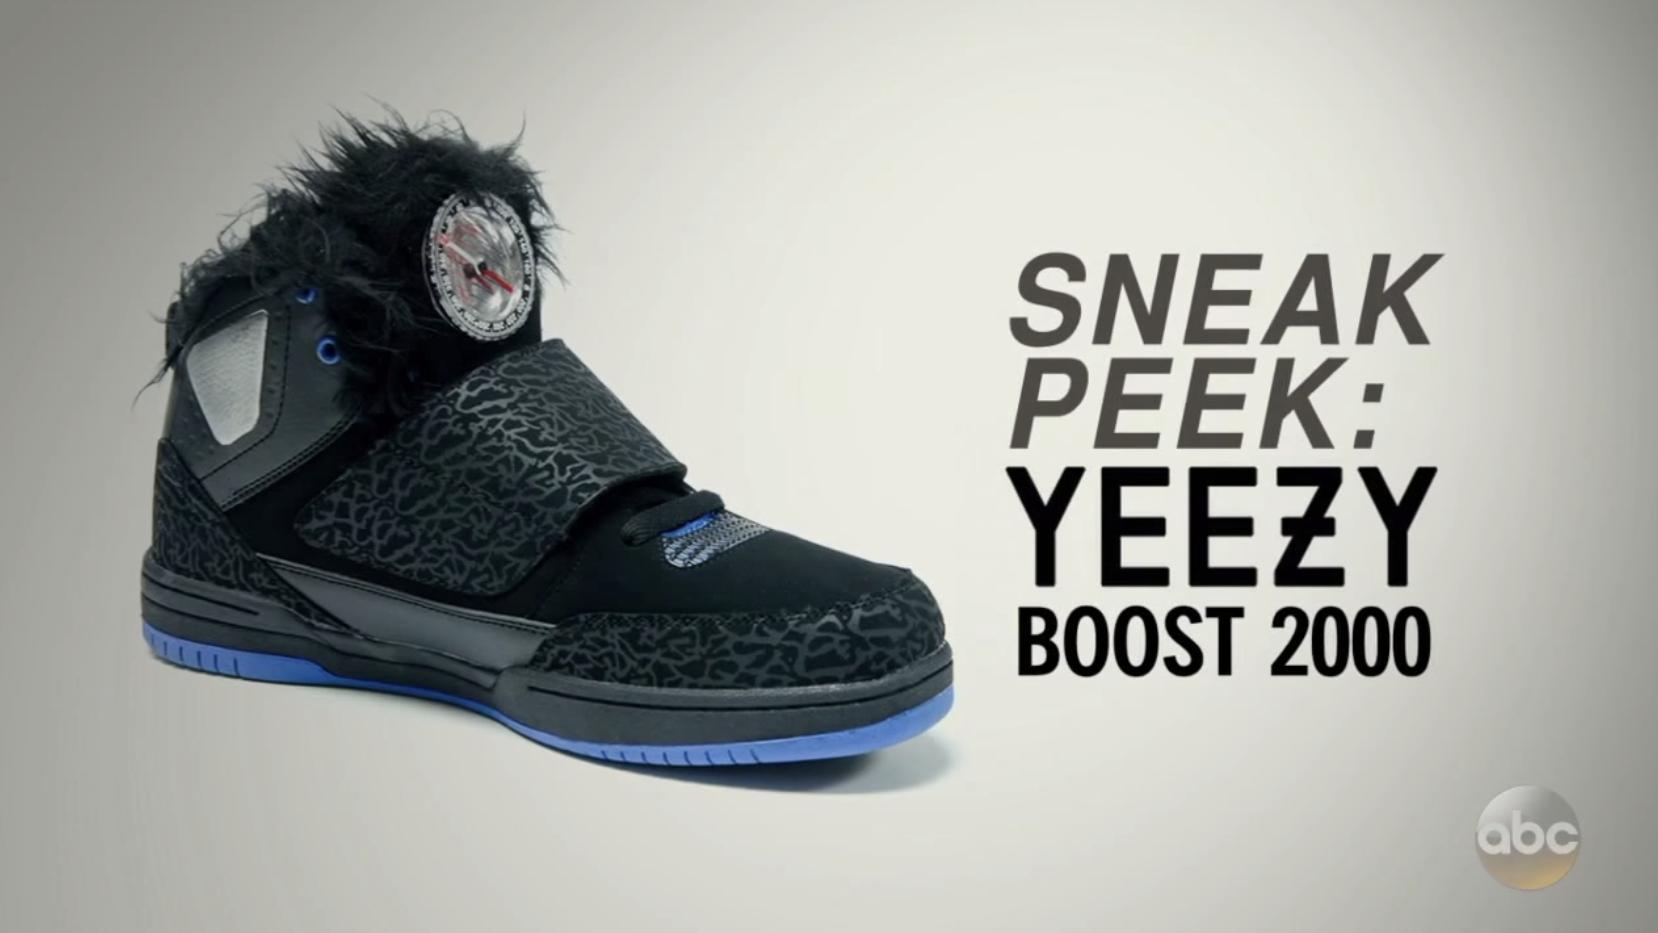 Sneak Peek Nike Shoes